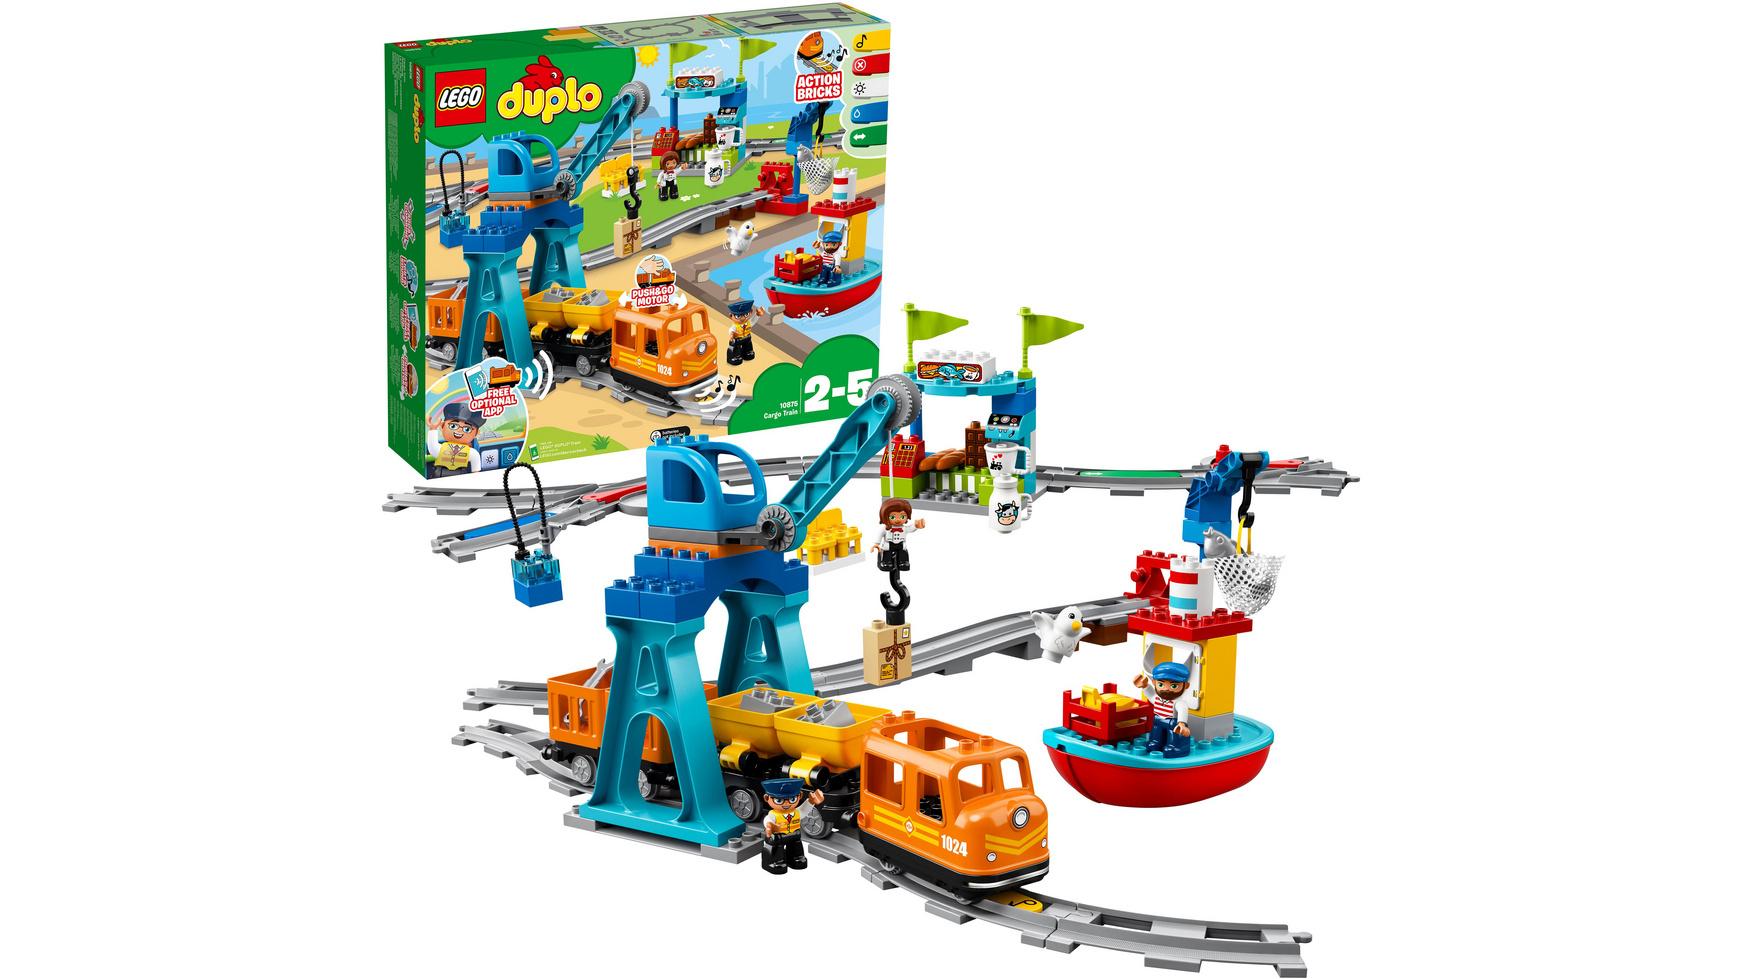 [Müller Filialabholung] LEGO Duplo 10875 Güterzug